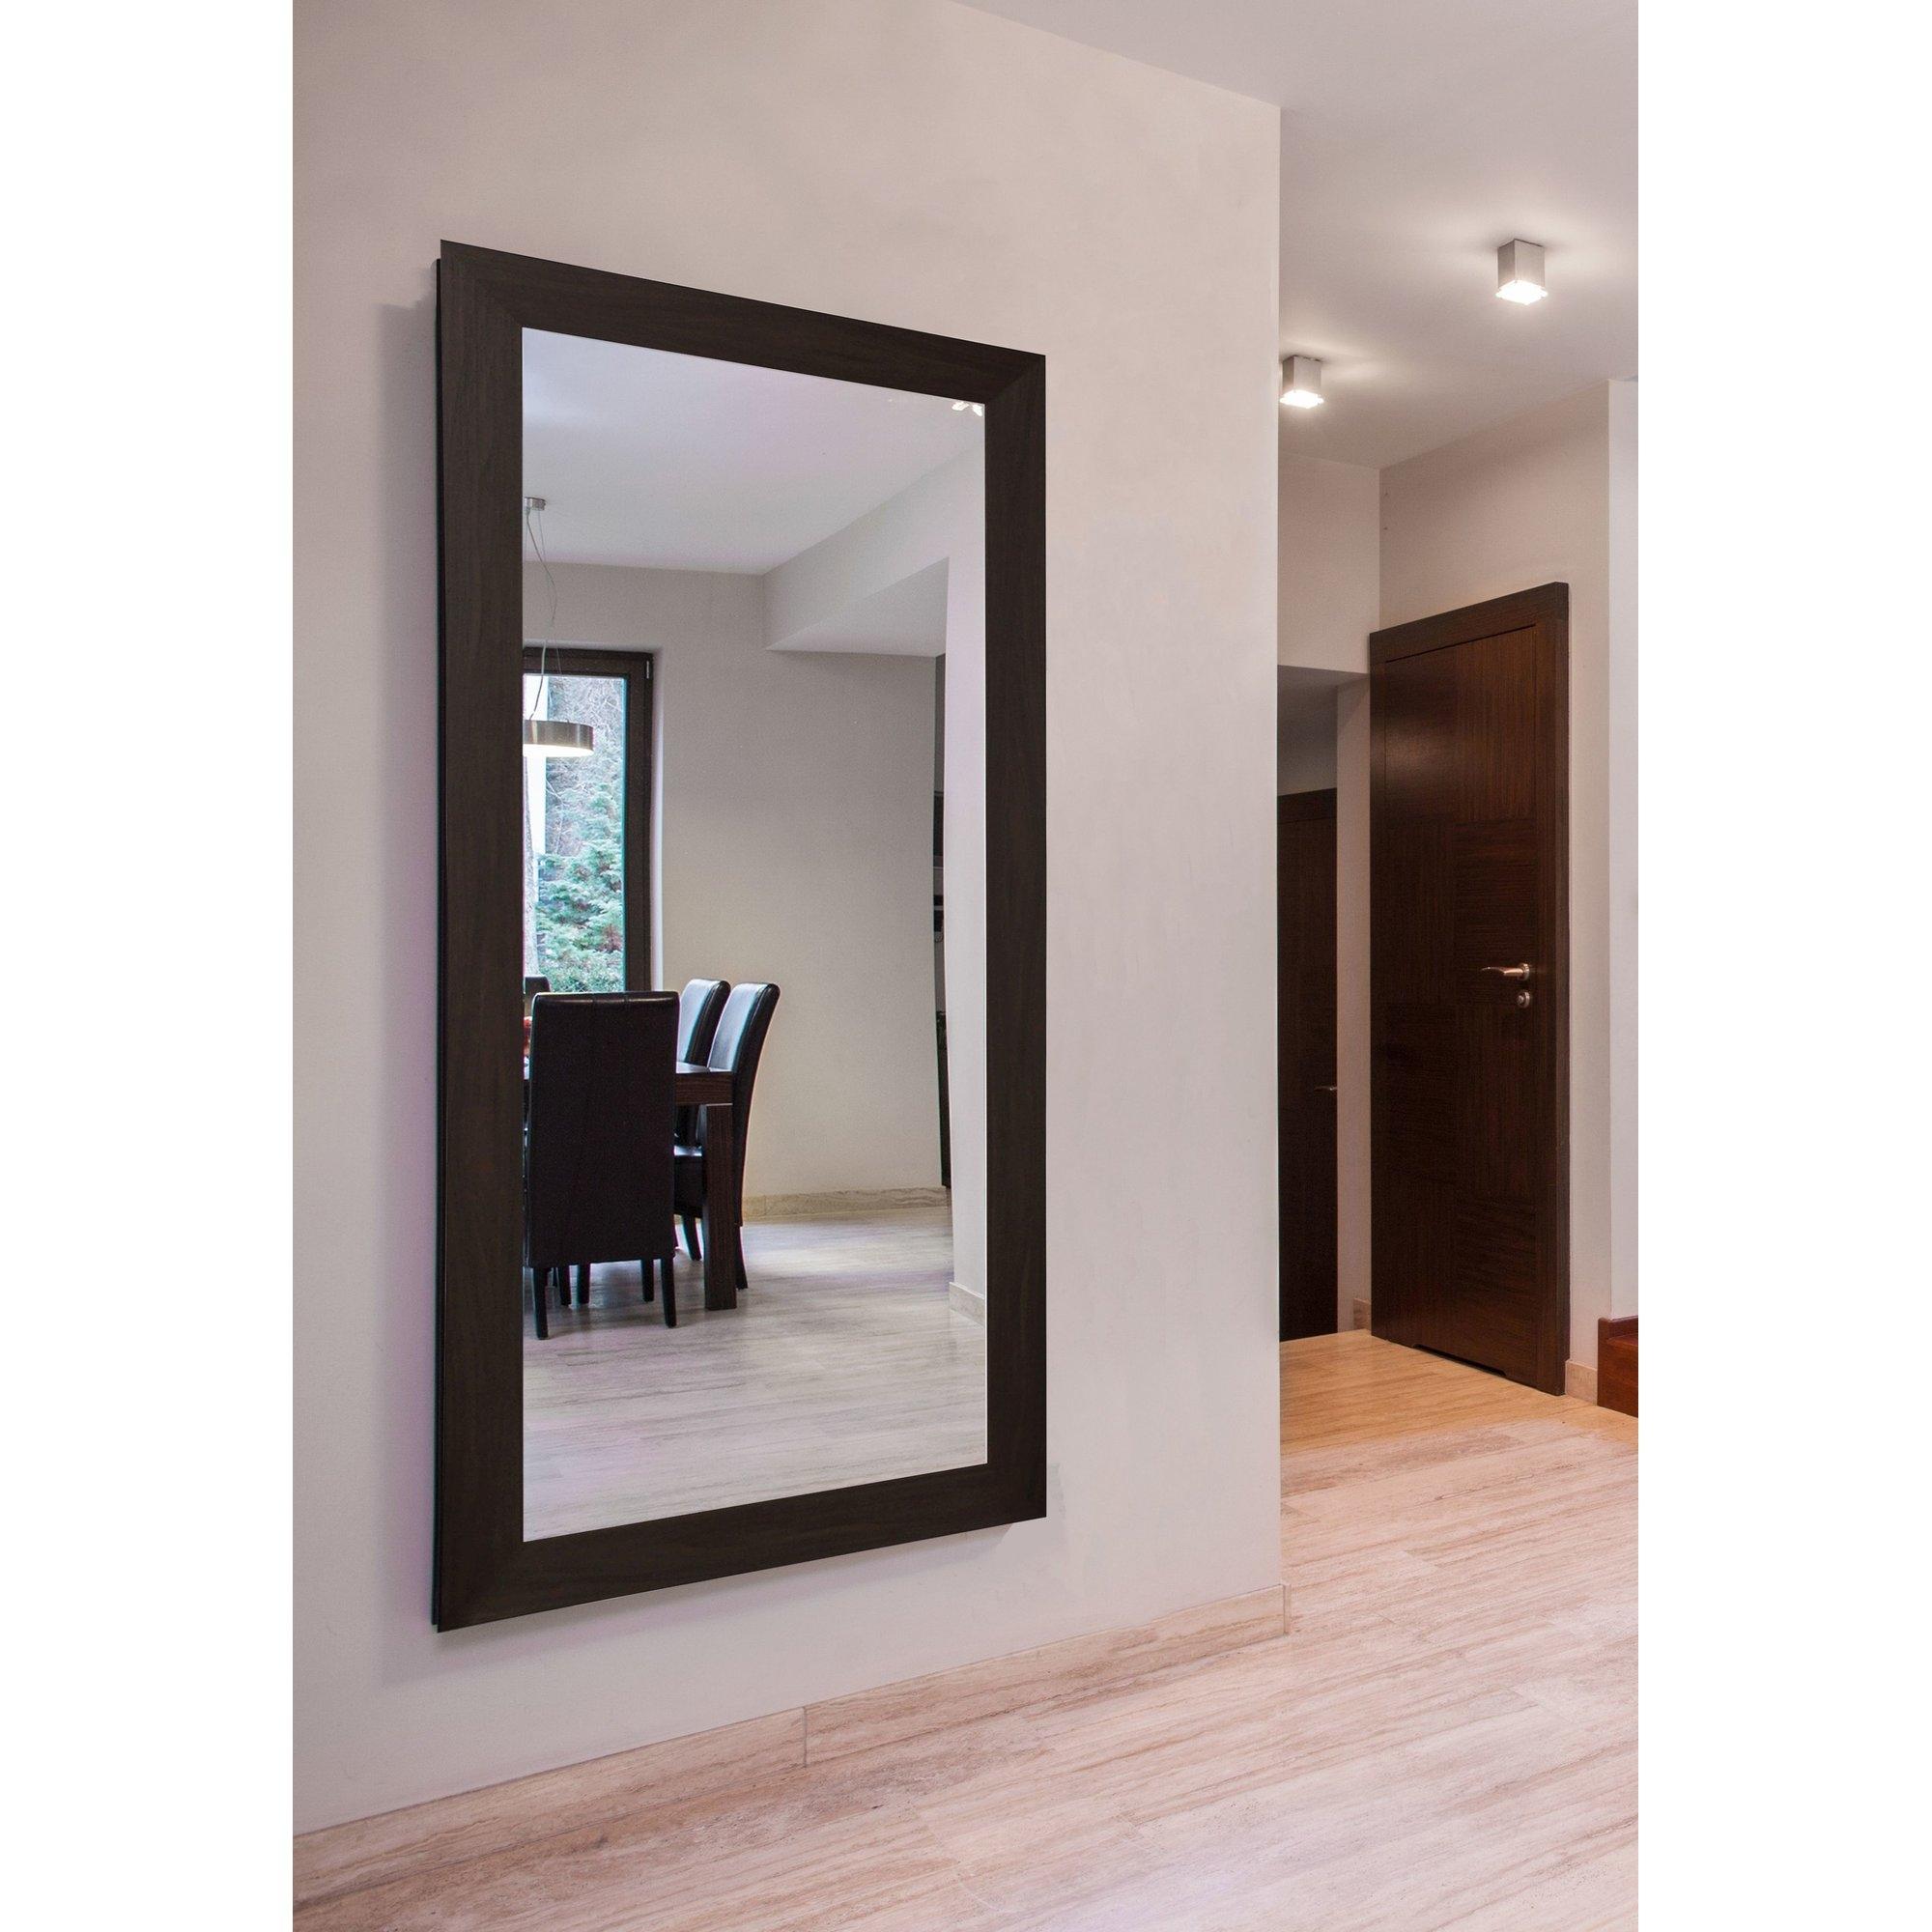 Extra Large Black Walnut Mirror Reviews Allmodern Regarding Large Black Mirrors (Image 11 of 15)